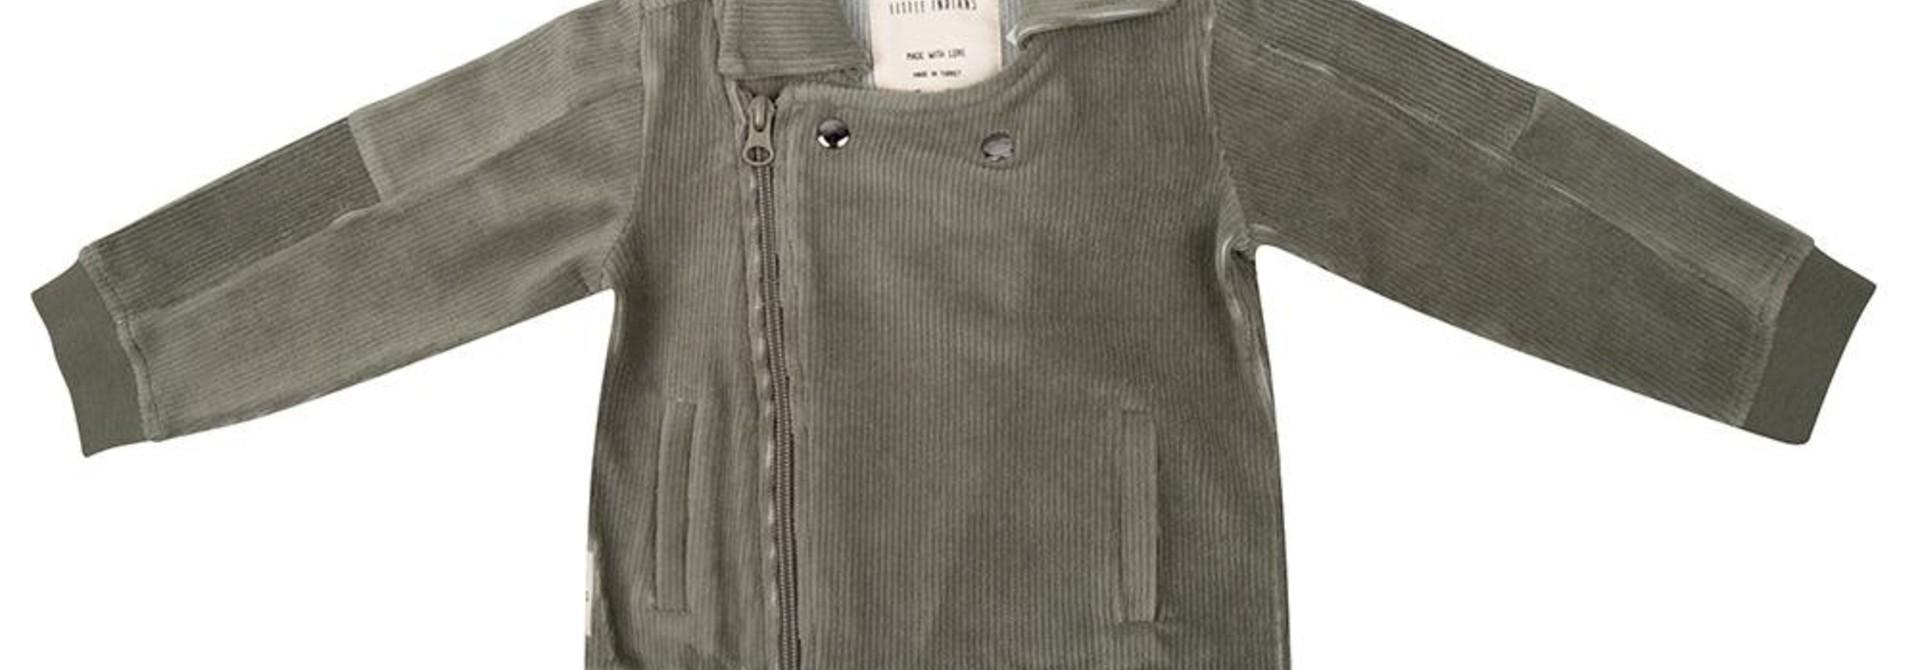 Little Indians jacket, 6j